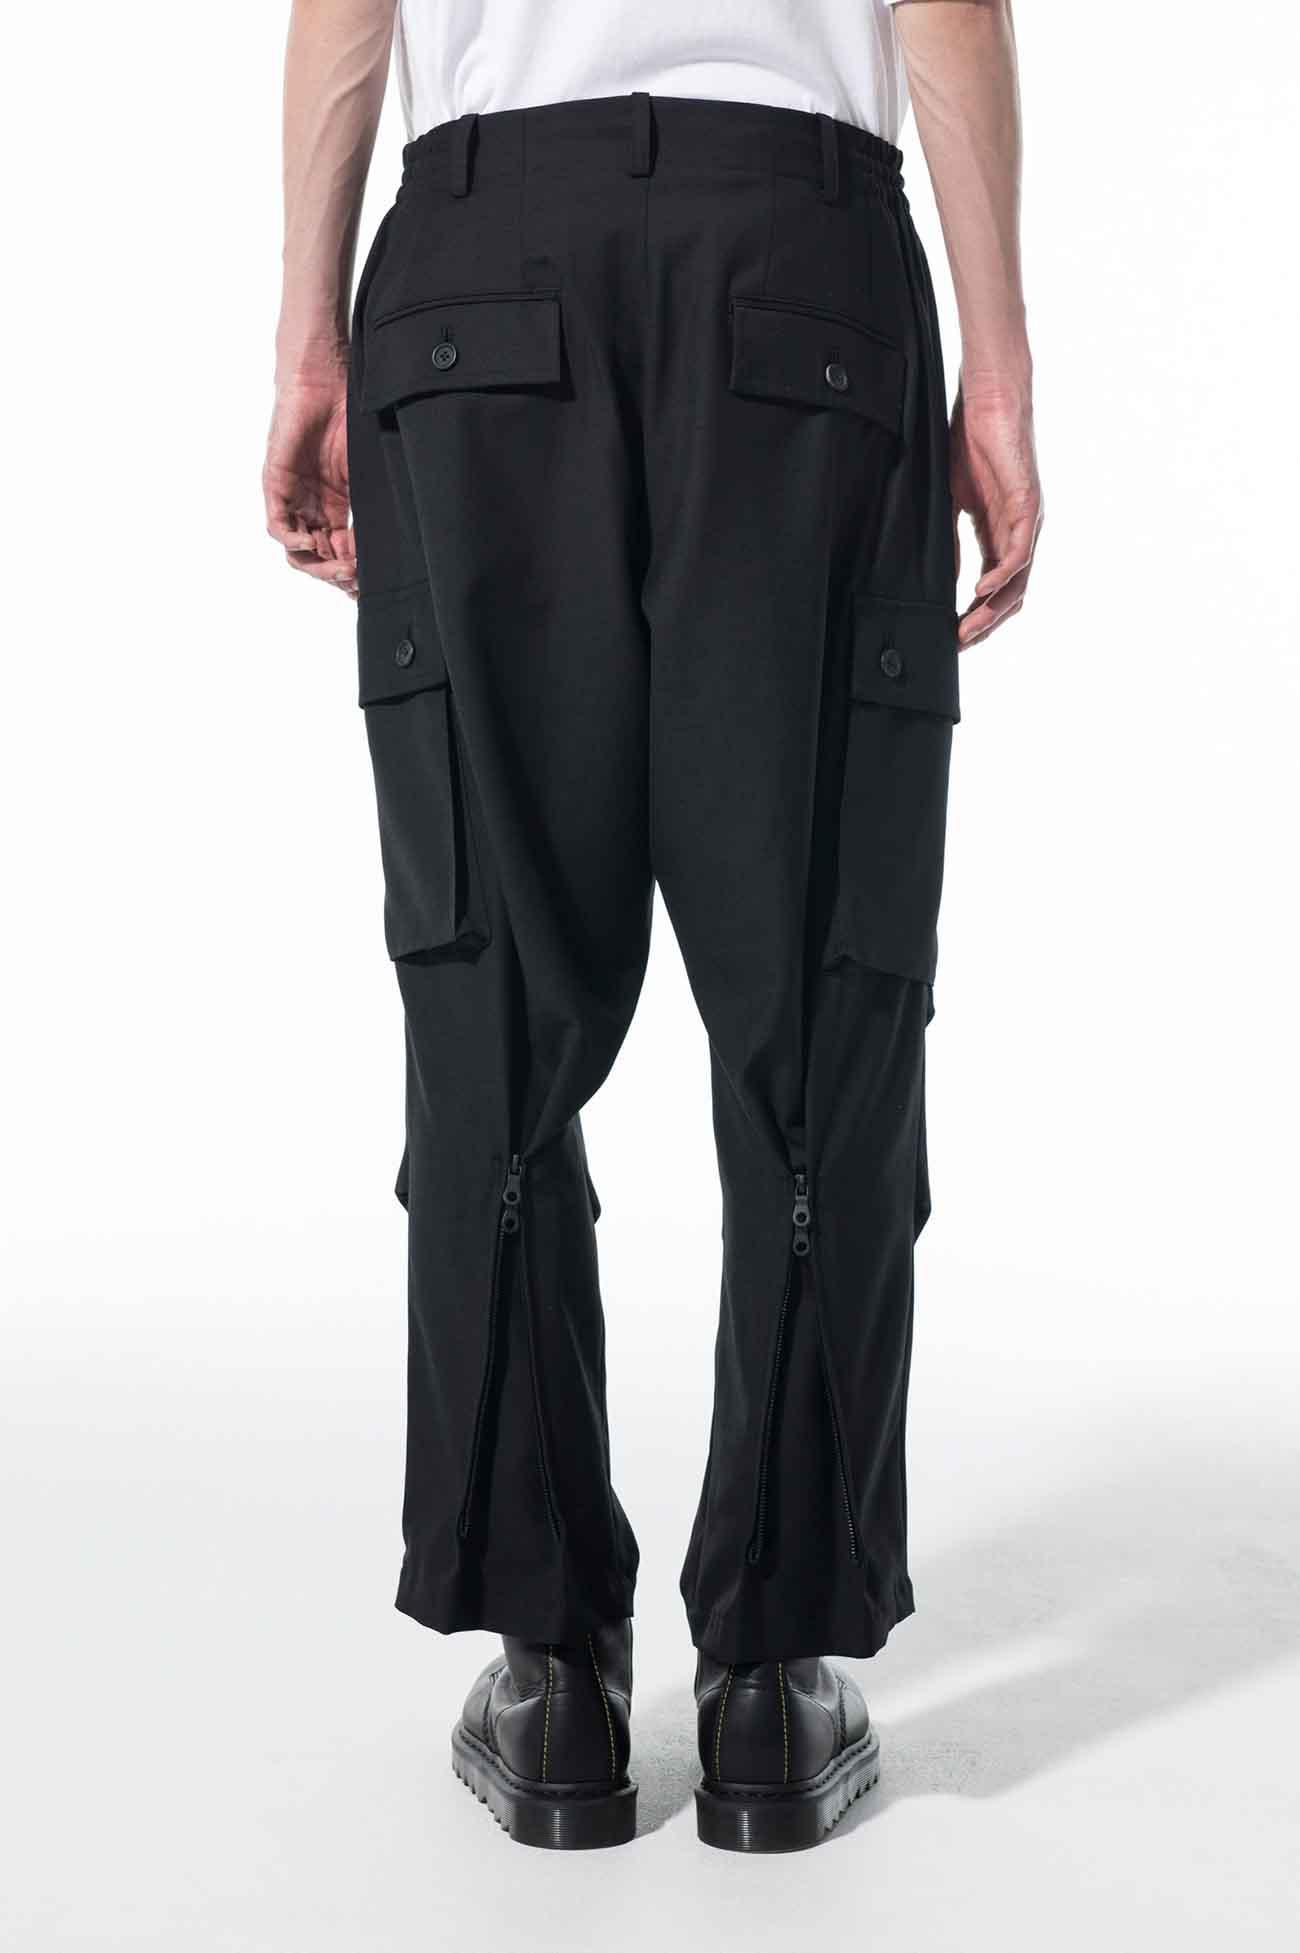 T/W Gabardine Washable one tuck Back Zipper 6-pocket Cargo pants